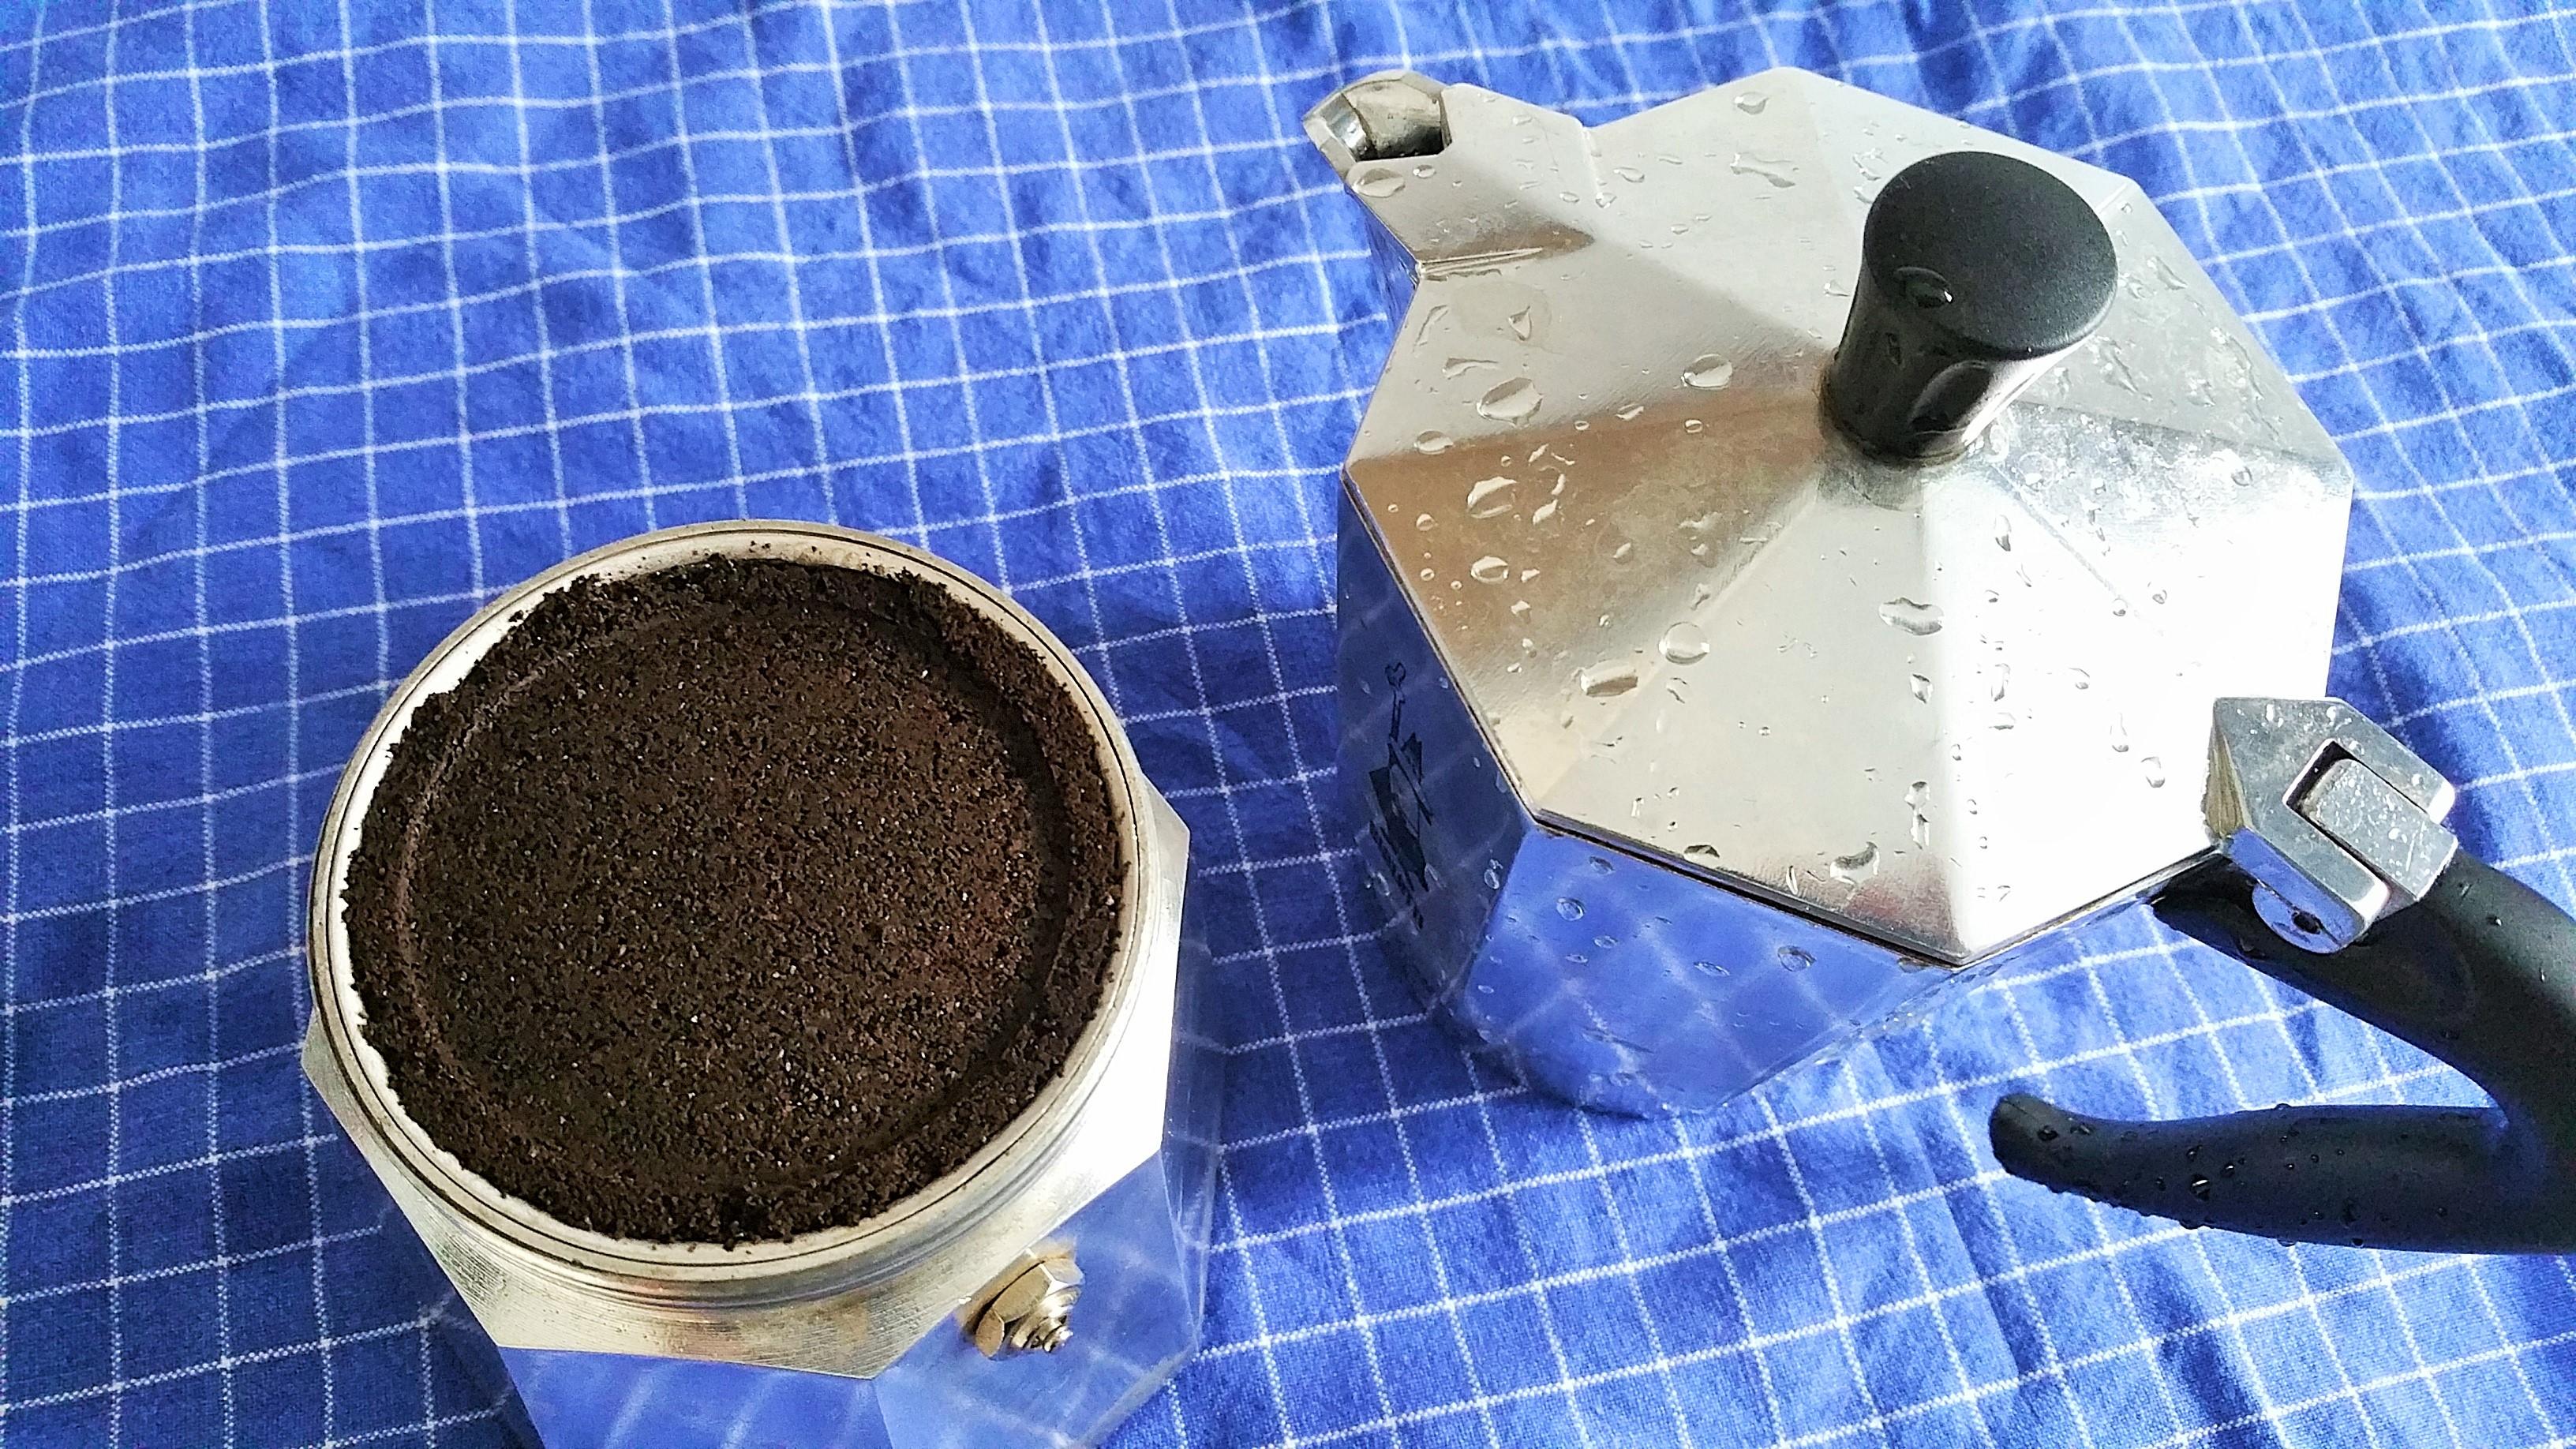 kaffee honig kokos l meersalz peeling m a s s l o s k o c h e n. Black Bedroom Furniture Sets. Home Design Ideas